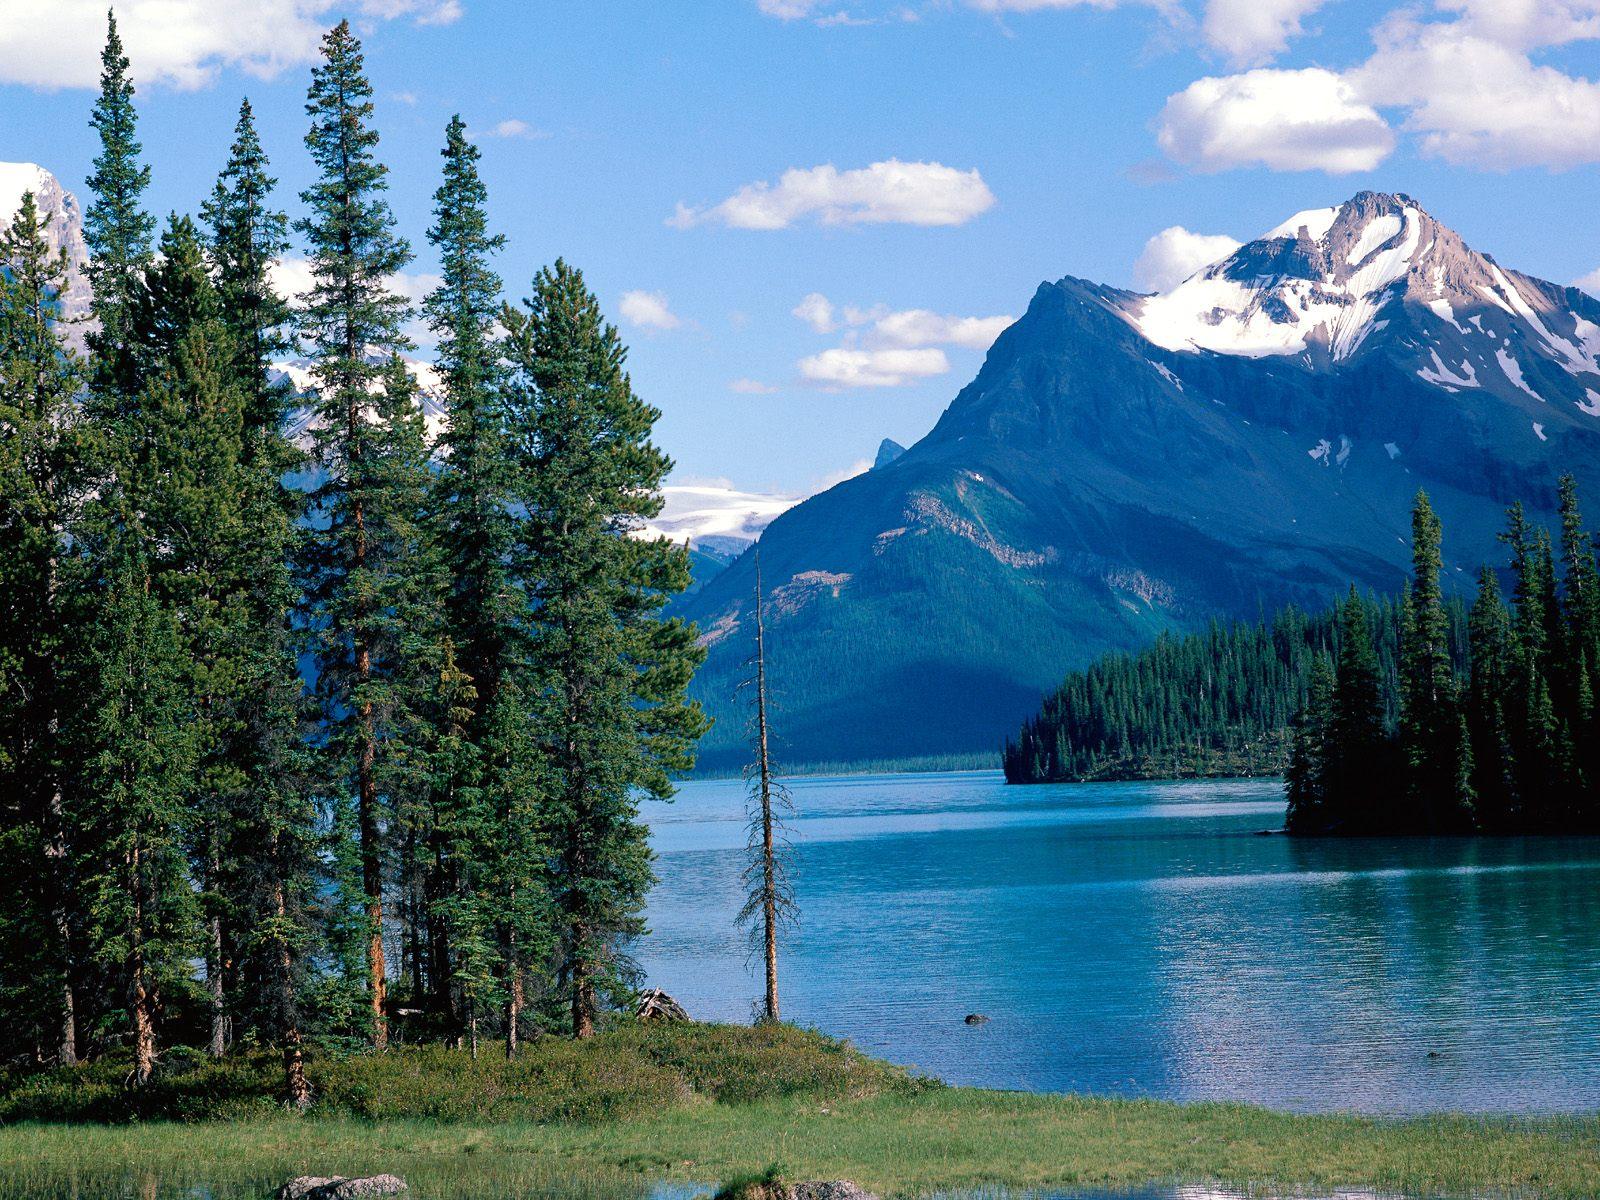 nationalpark alberta kanada - photo #24